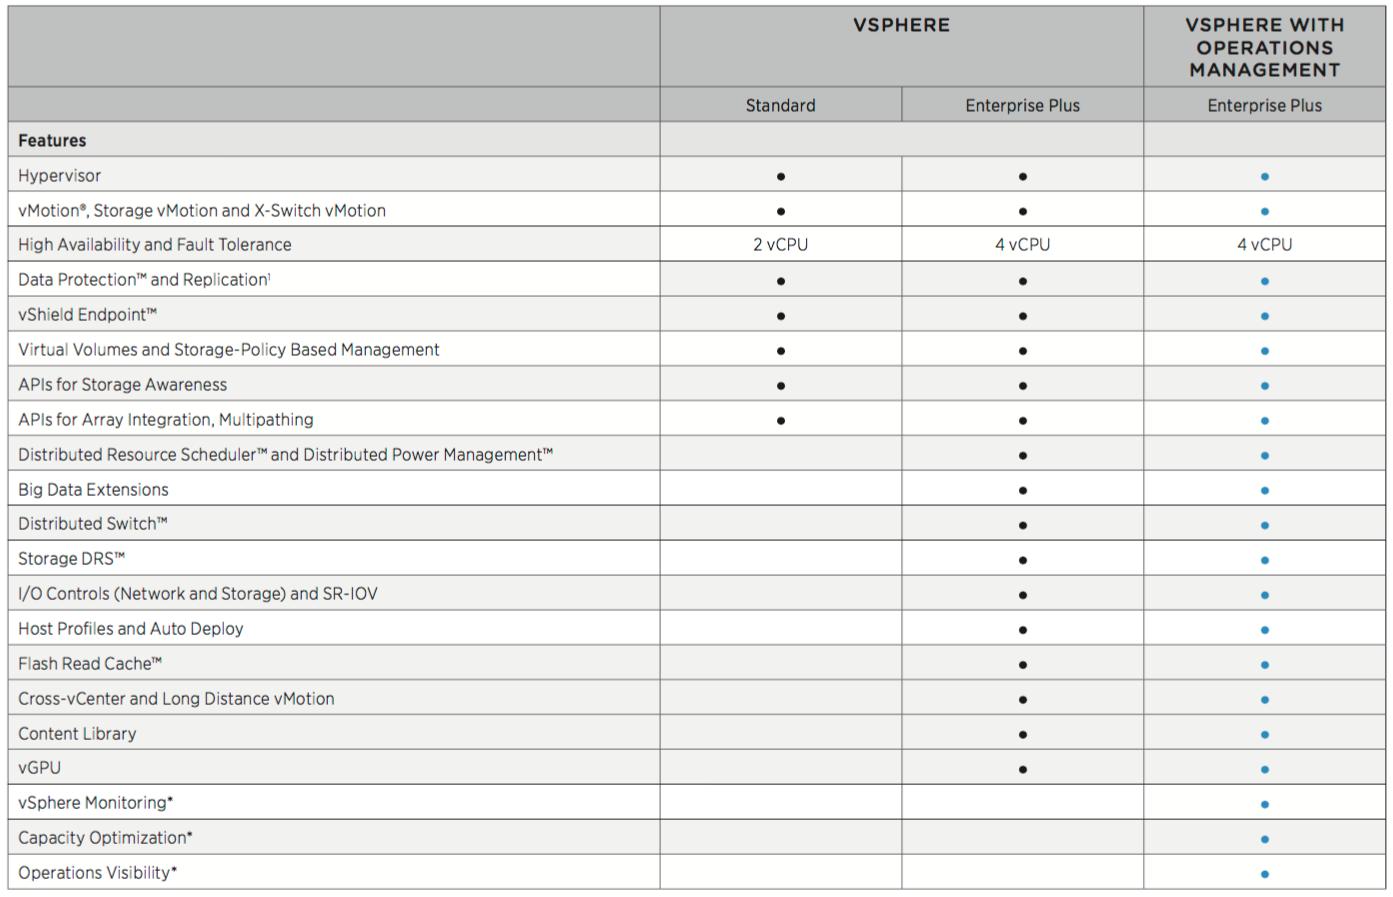 VMware vSphere Enterprise license discontinued / Ent+ upgrade promotion available